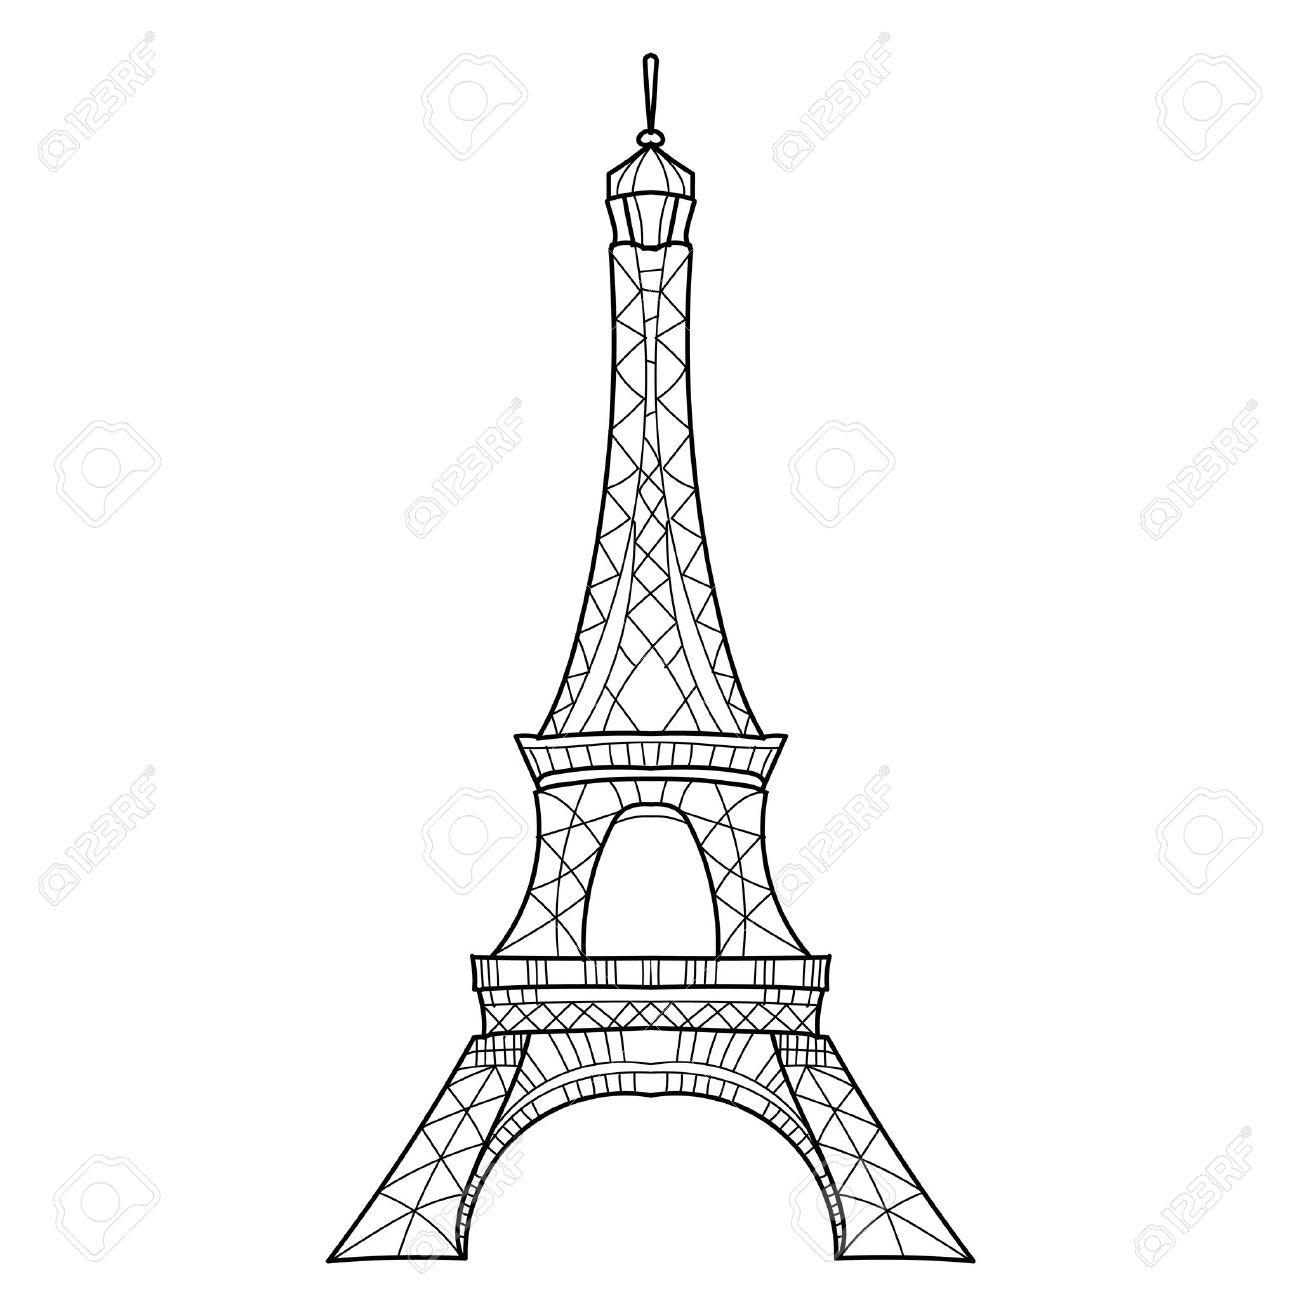 1300x1300 Zentangle Stylized Eiffel Tower Hand Drawn Vector Illustration